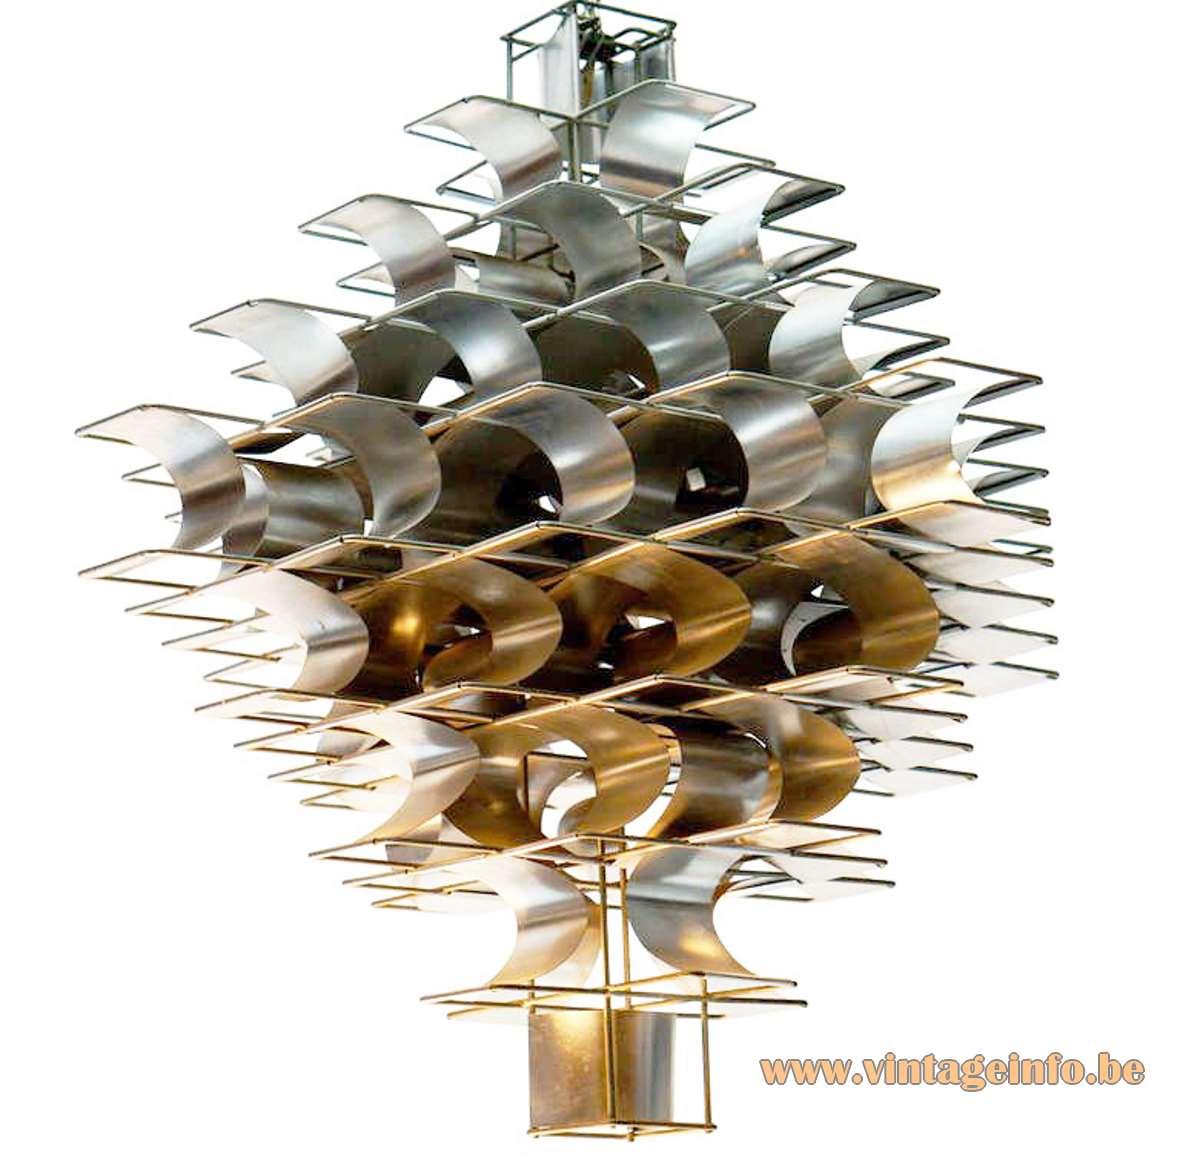 Max Sauze Cassiopé pendant lamp 1970s design curved folded aluminium slats metal iron wire frame France